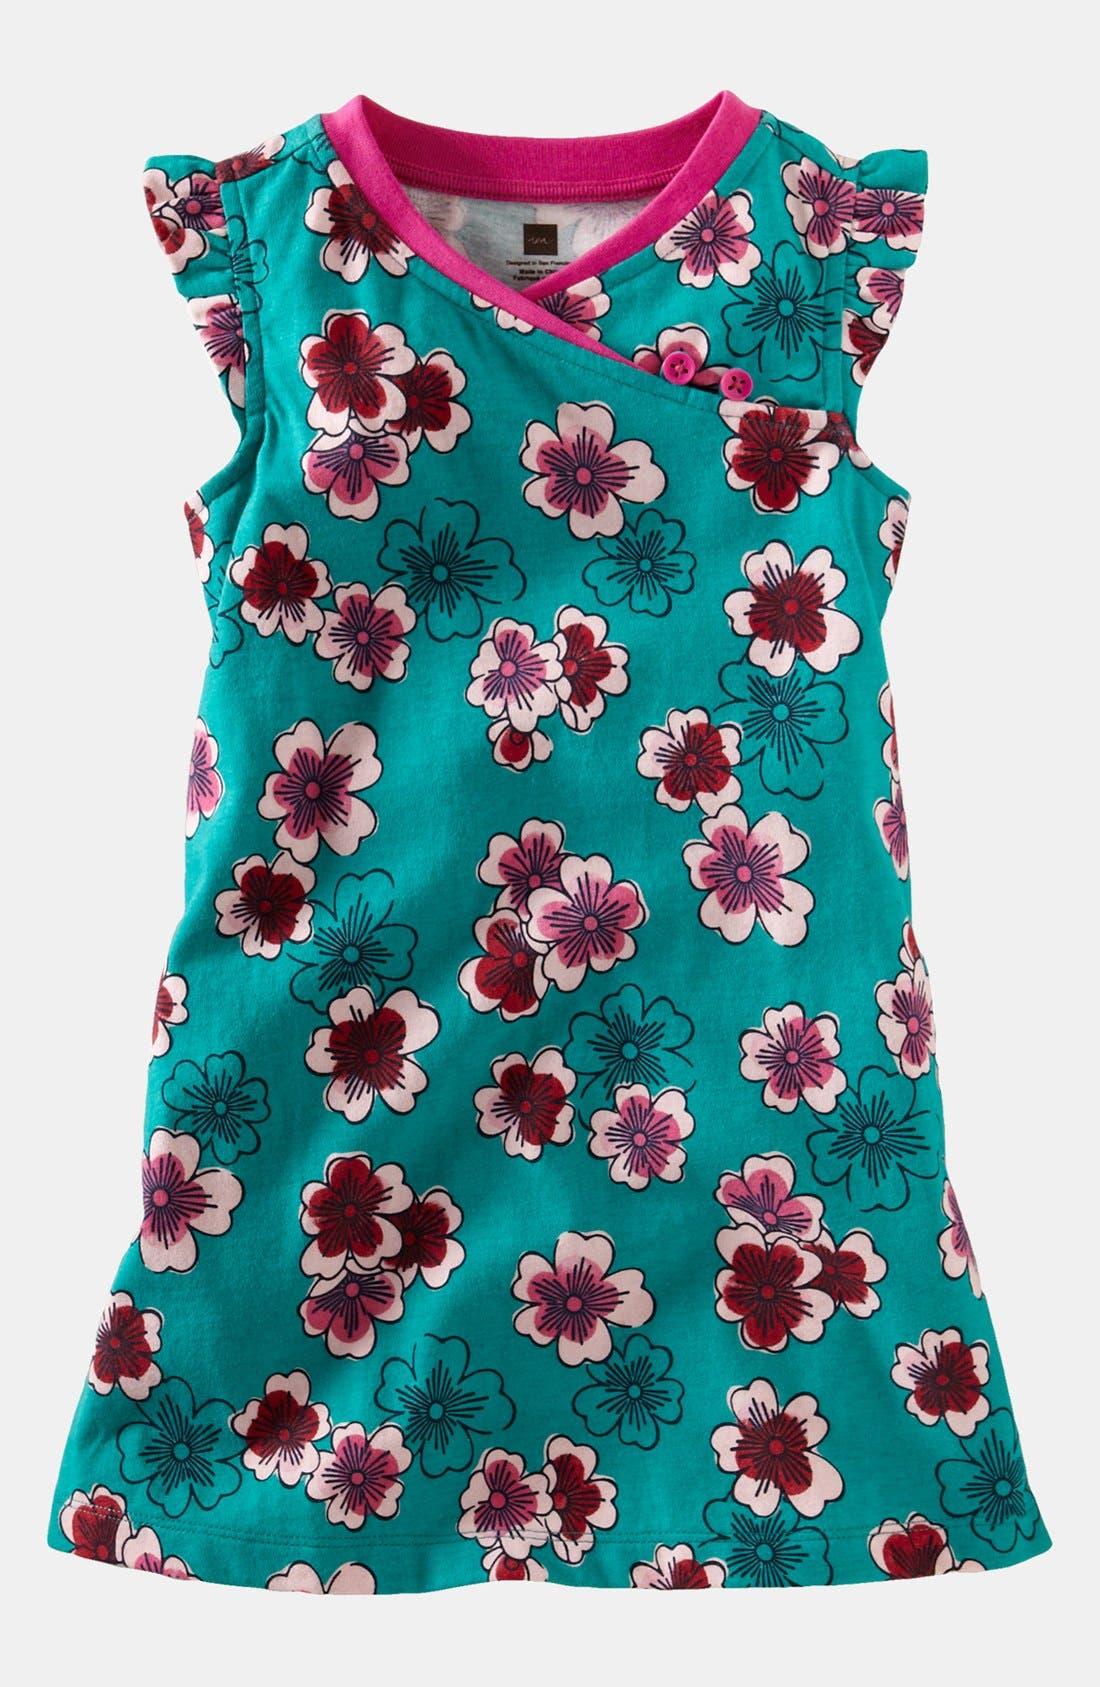 Alternate Image 1 Selected - Tea Collection 'Plum Blossom' Minidress (Baby Girls)